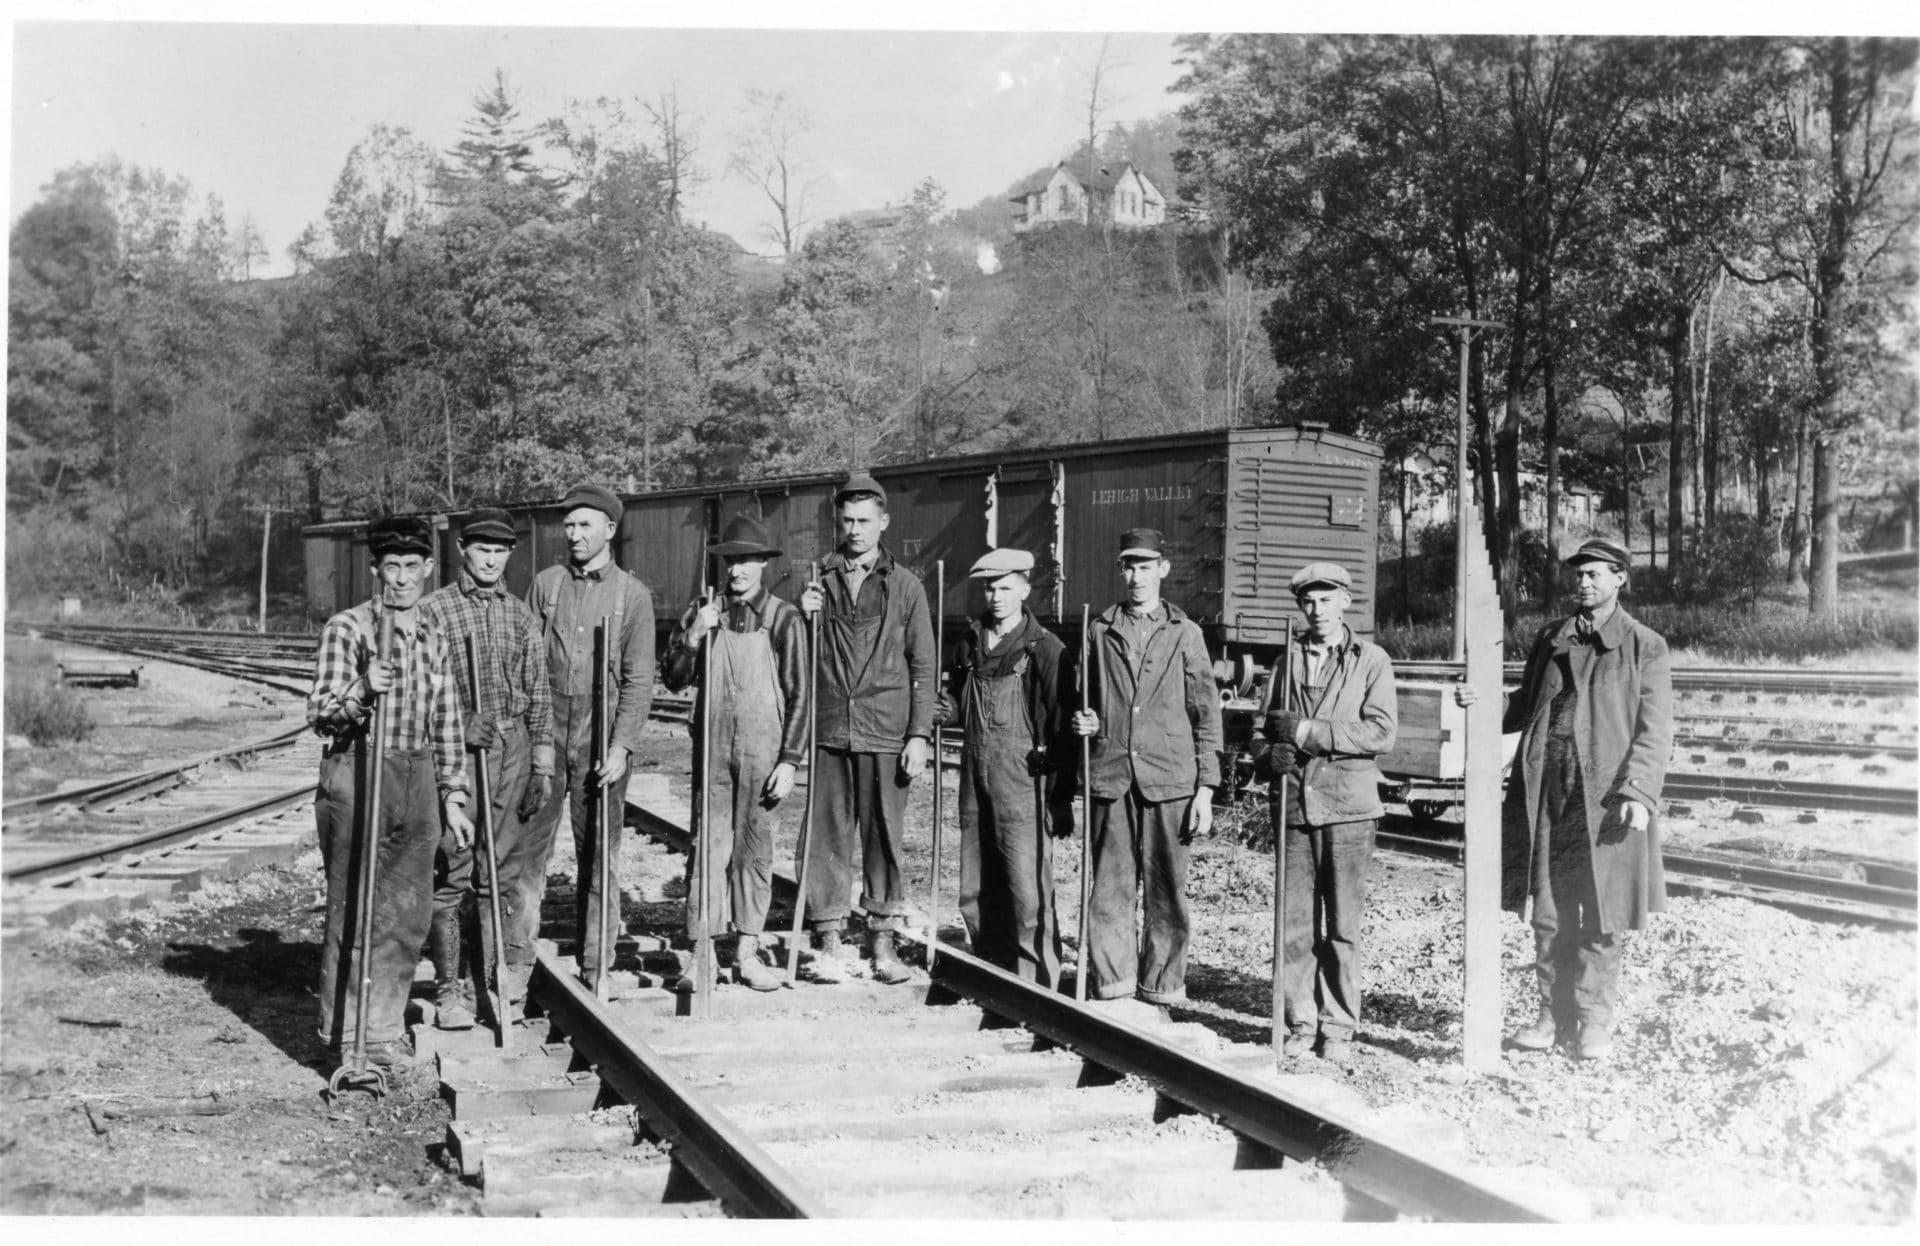 historic photo of railroad workers near Hendricks in 1923